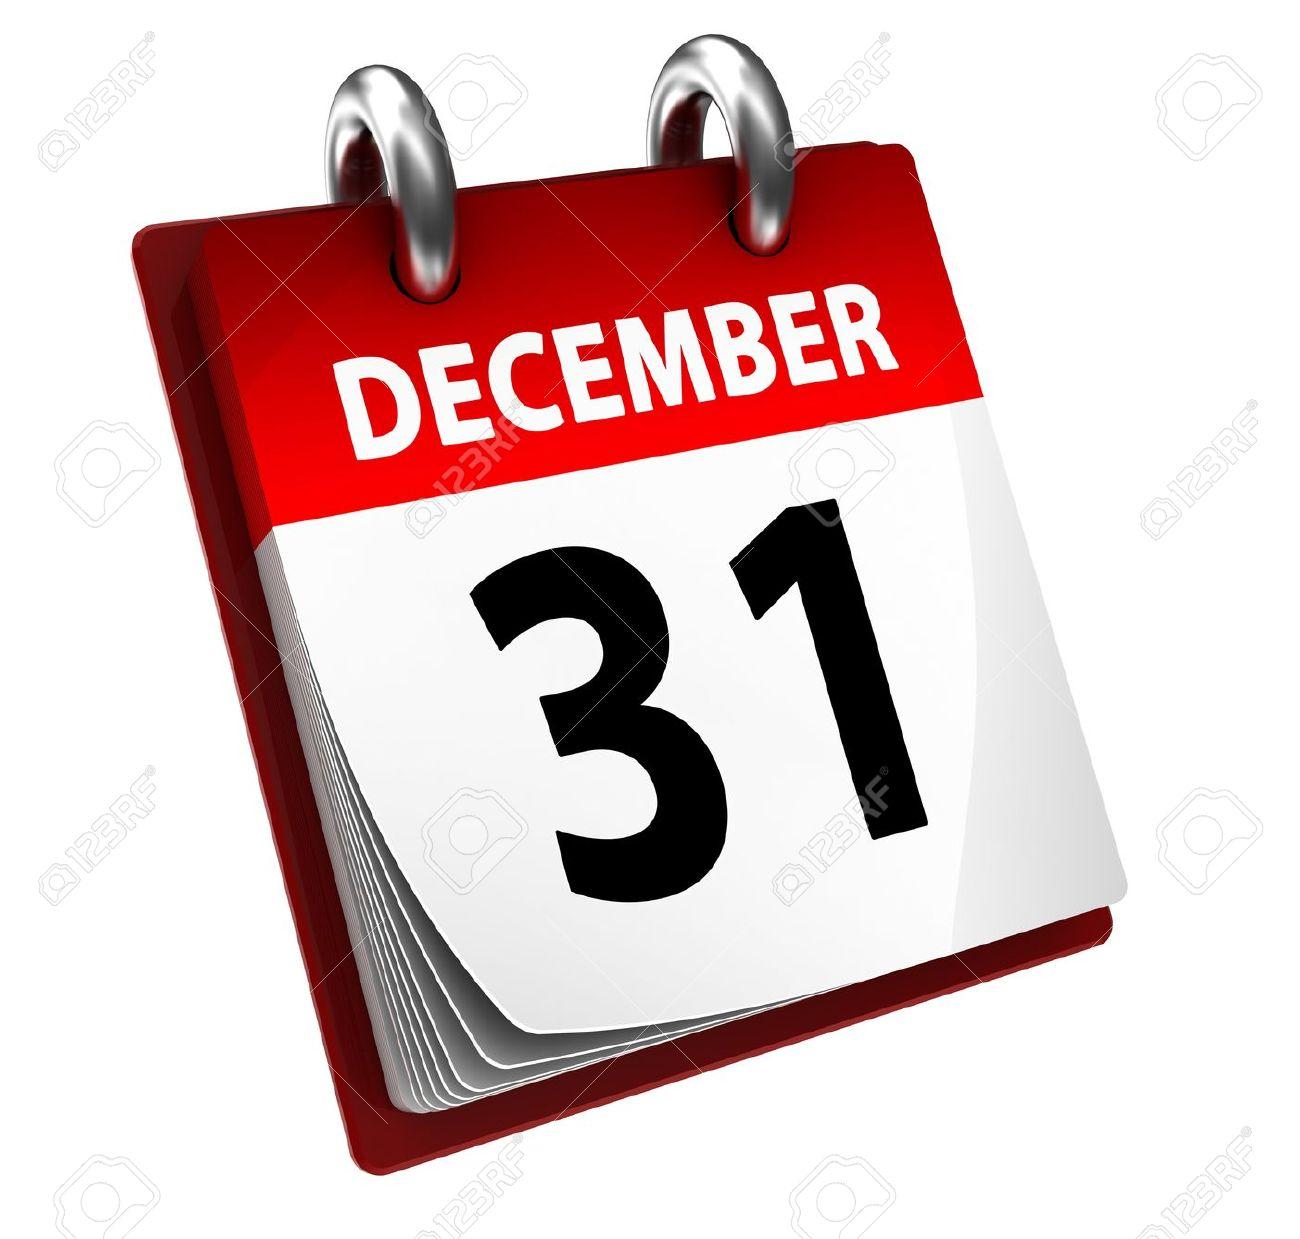 December date calendar clipart graphic transparent download 31 December Calendar Stock Photo, Picture And Royalty Free Image ... graphic transparent download